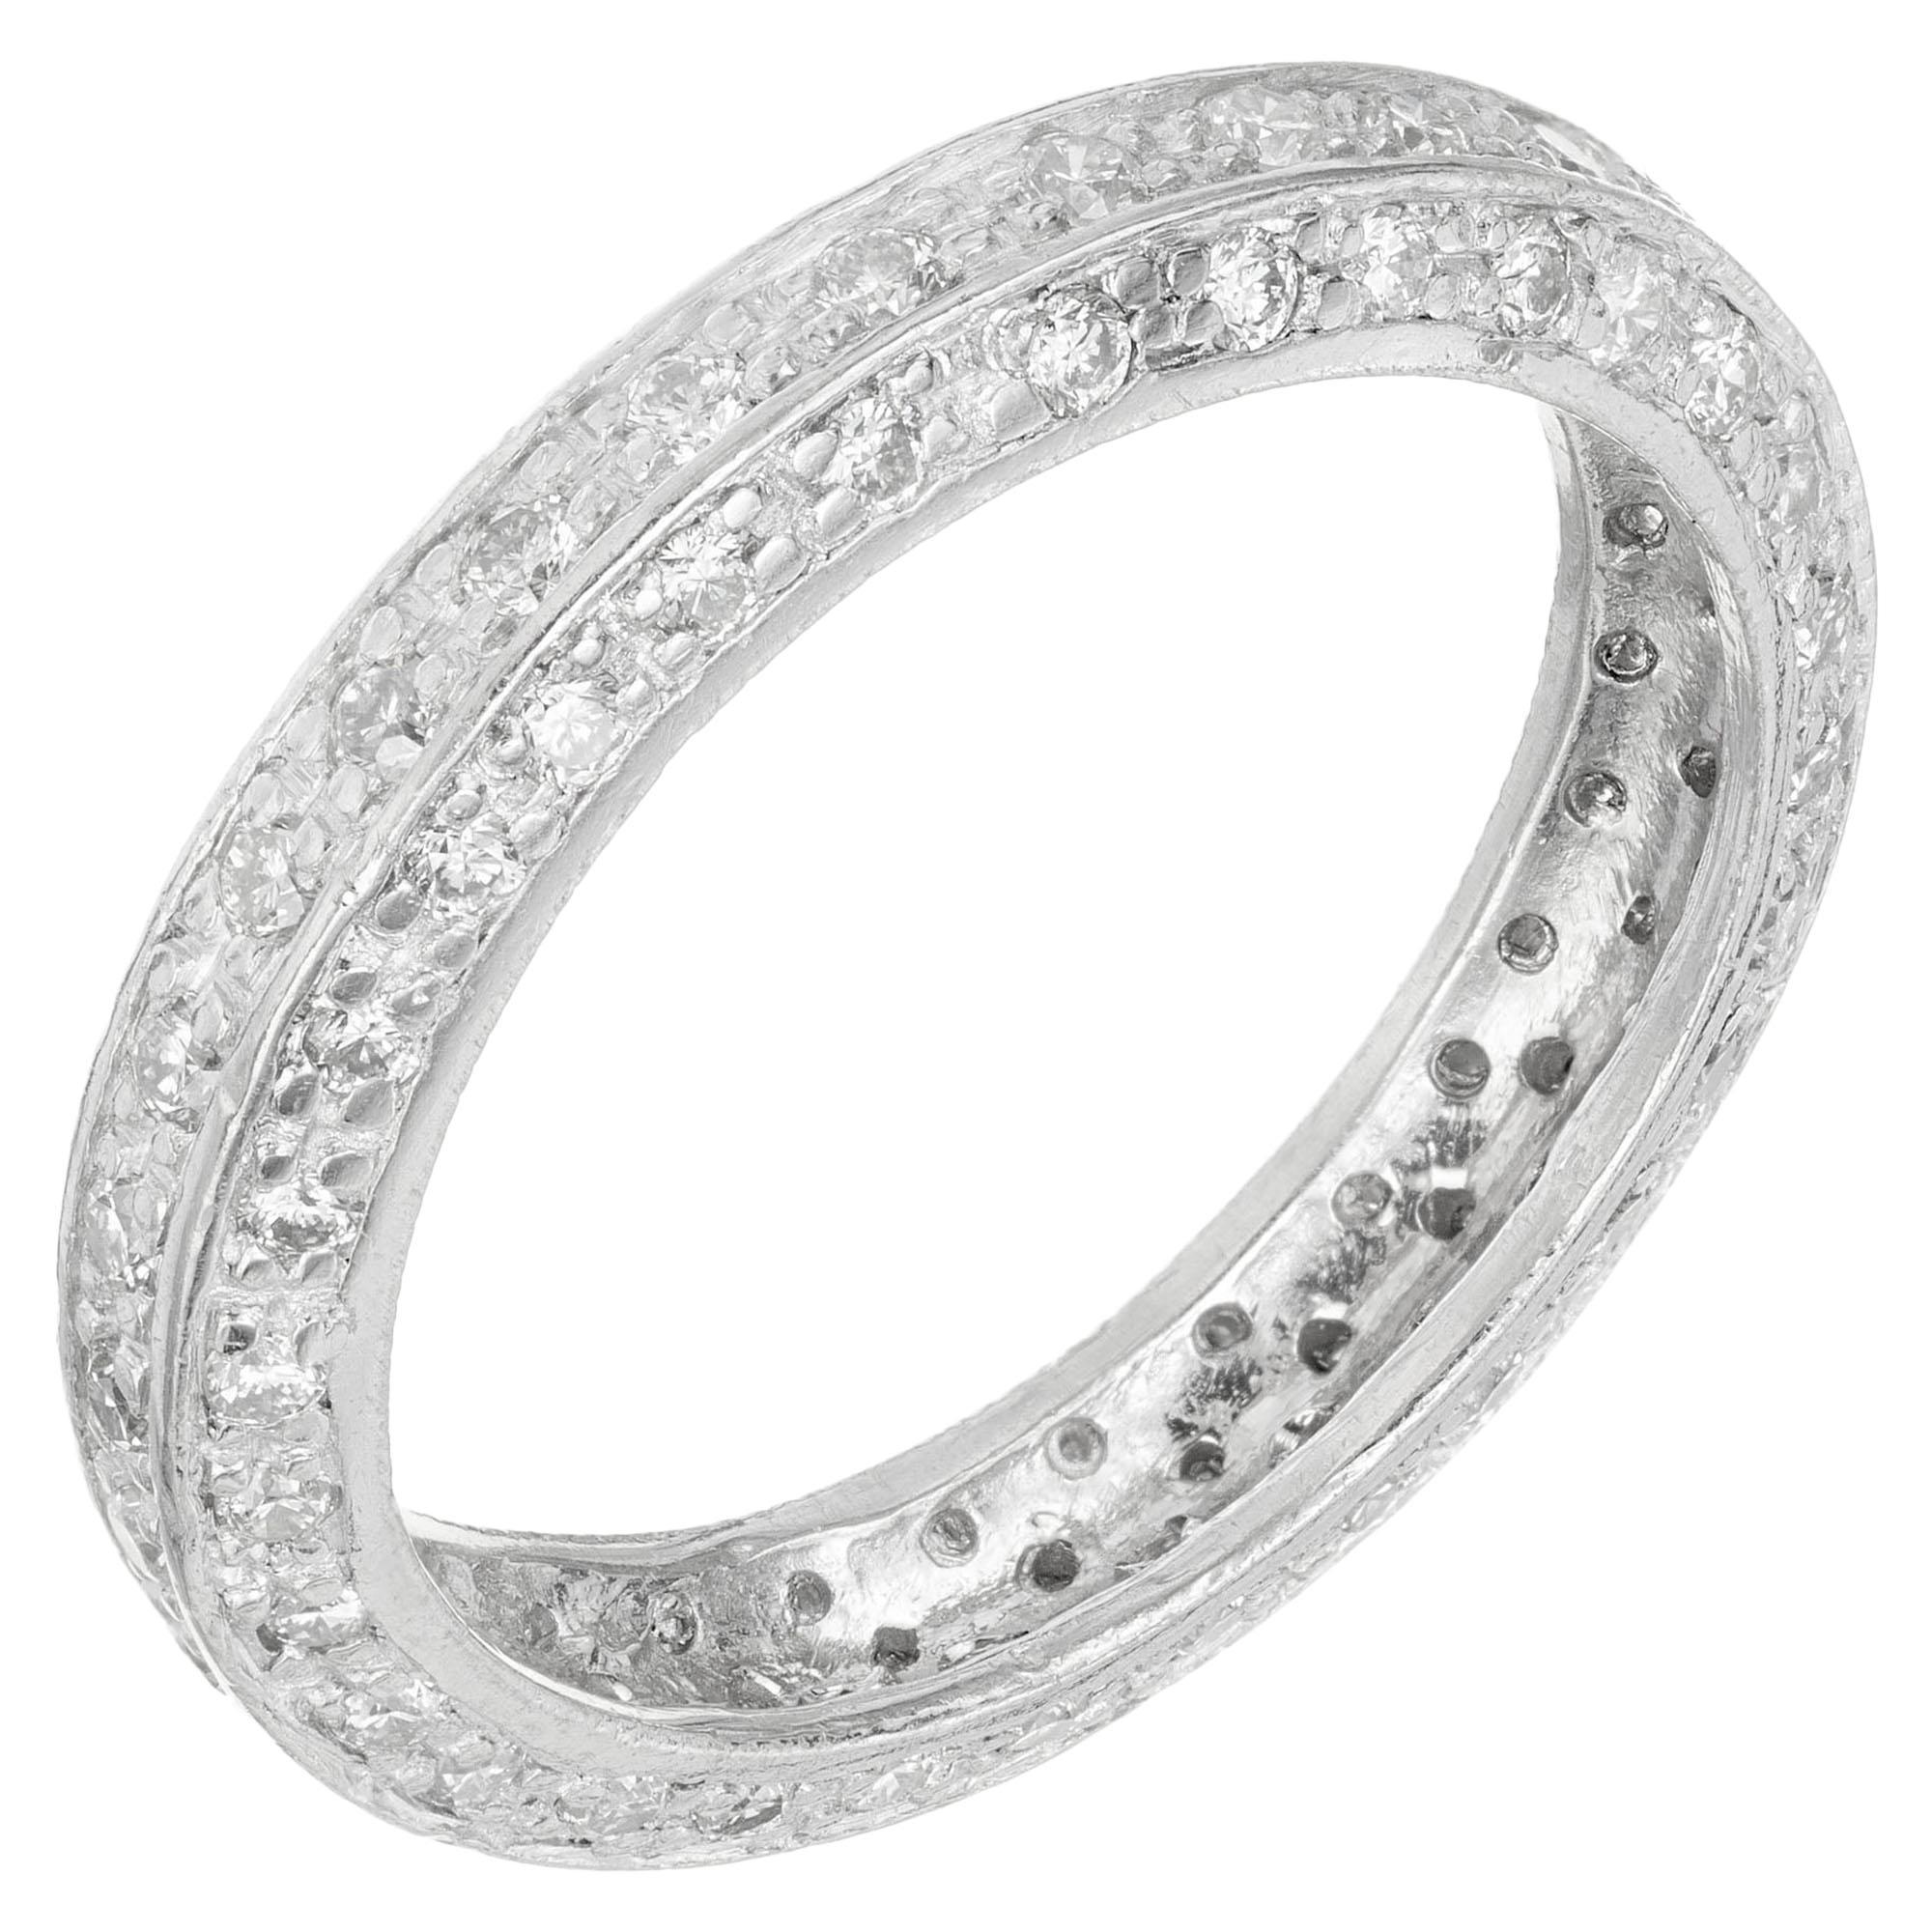 1.00 Carat 3-Row Diamond Platinum Eternity Wedding Band Ring